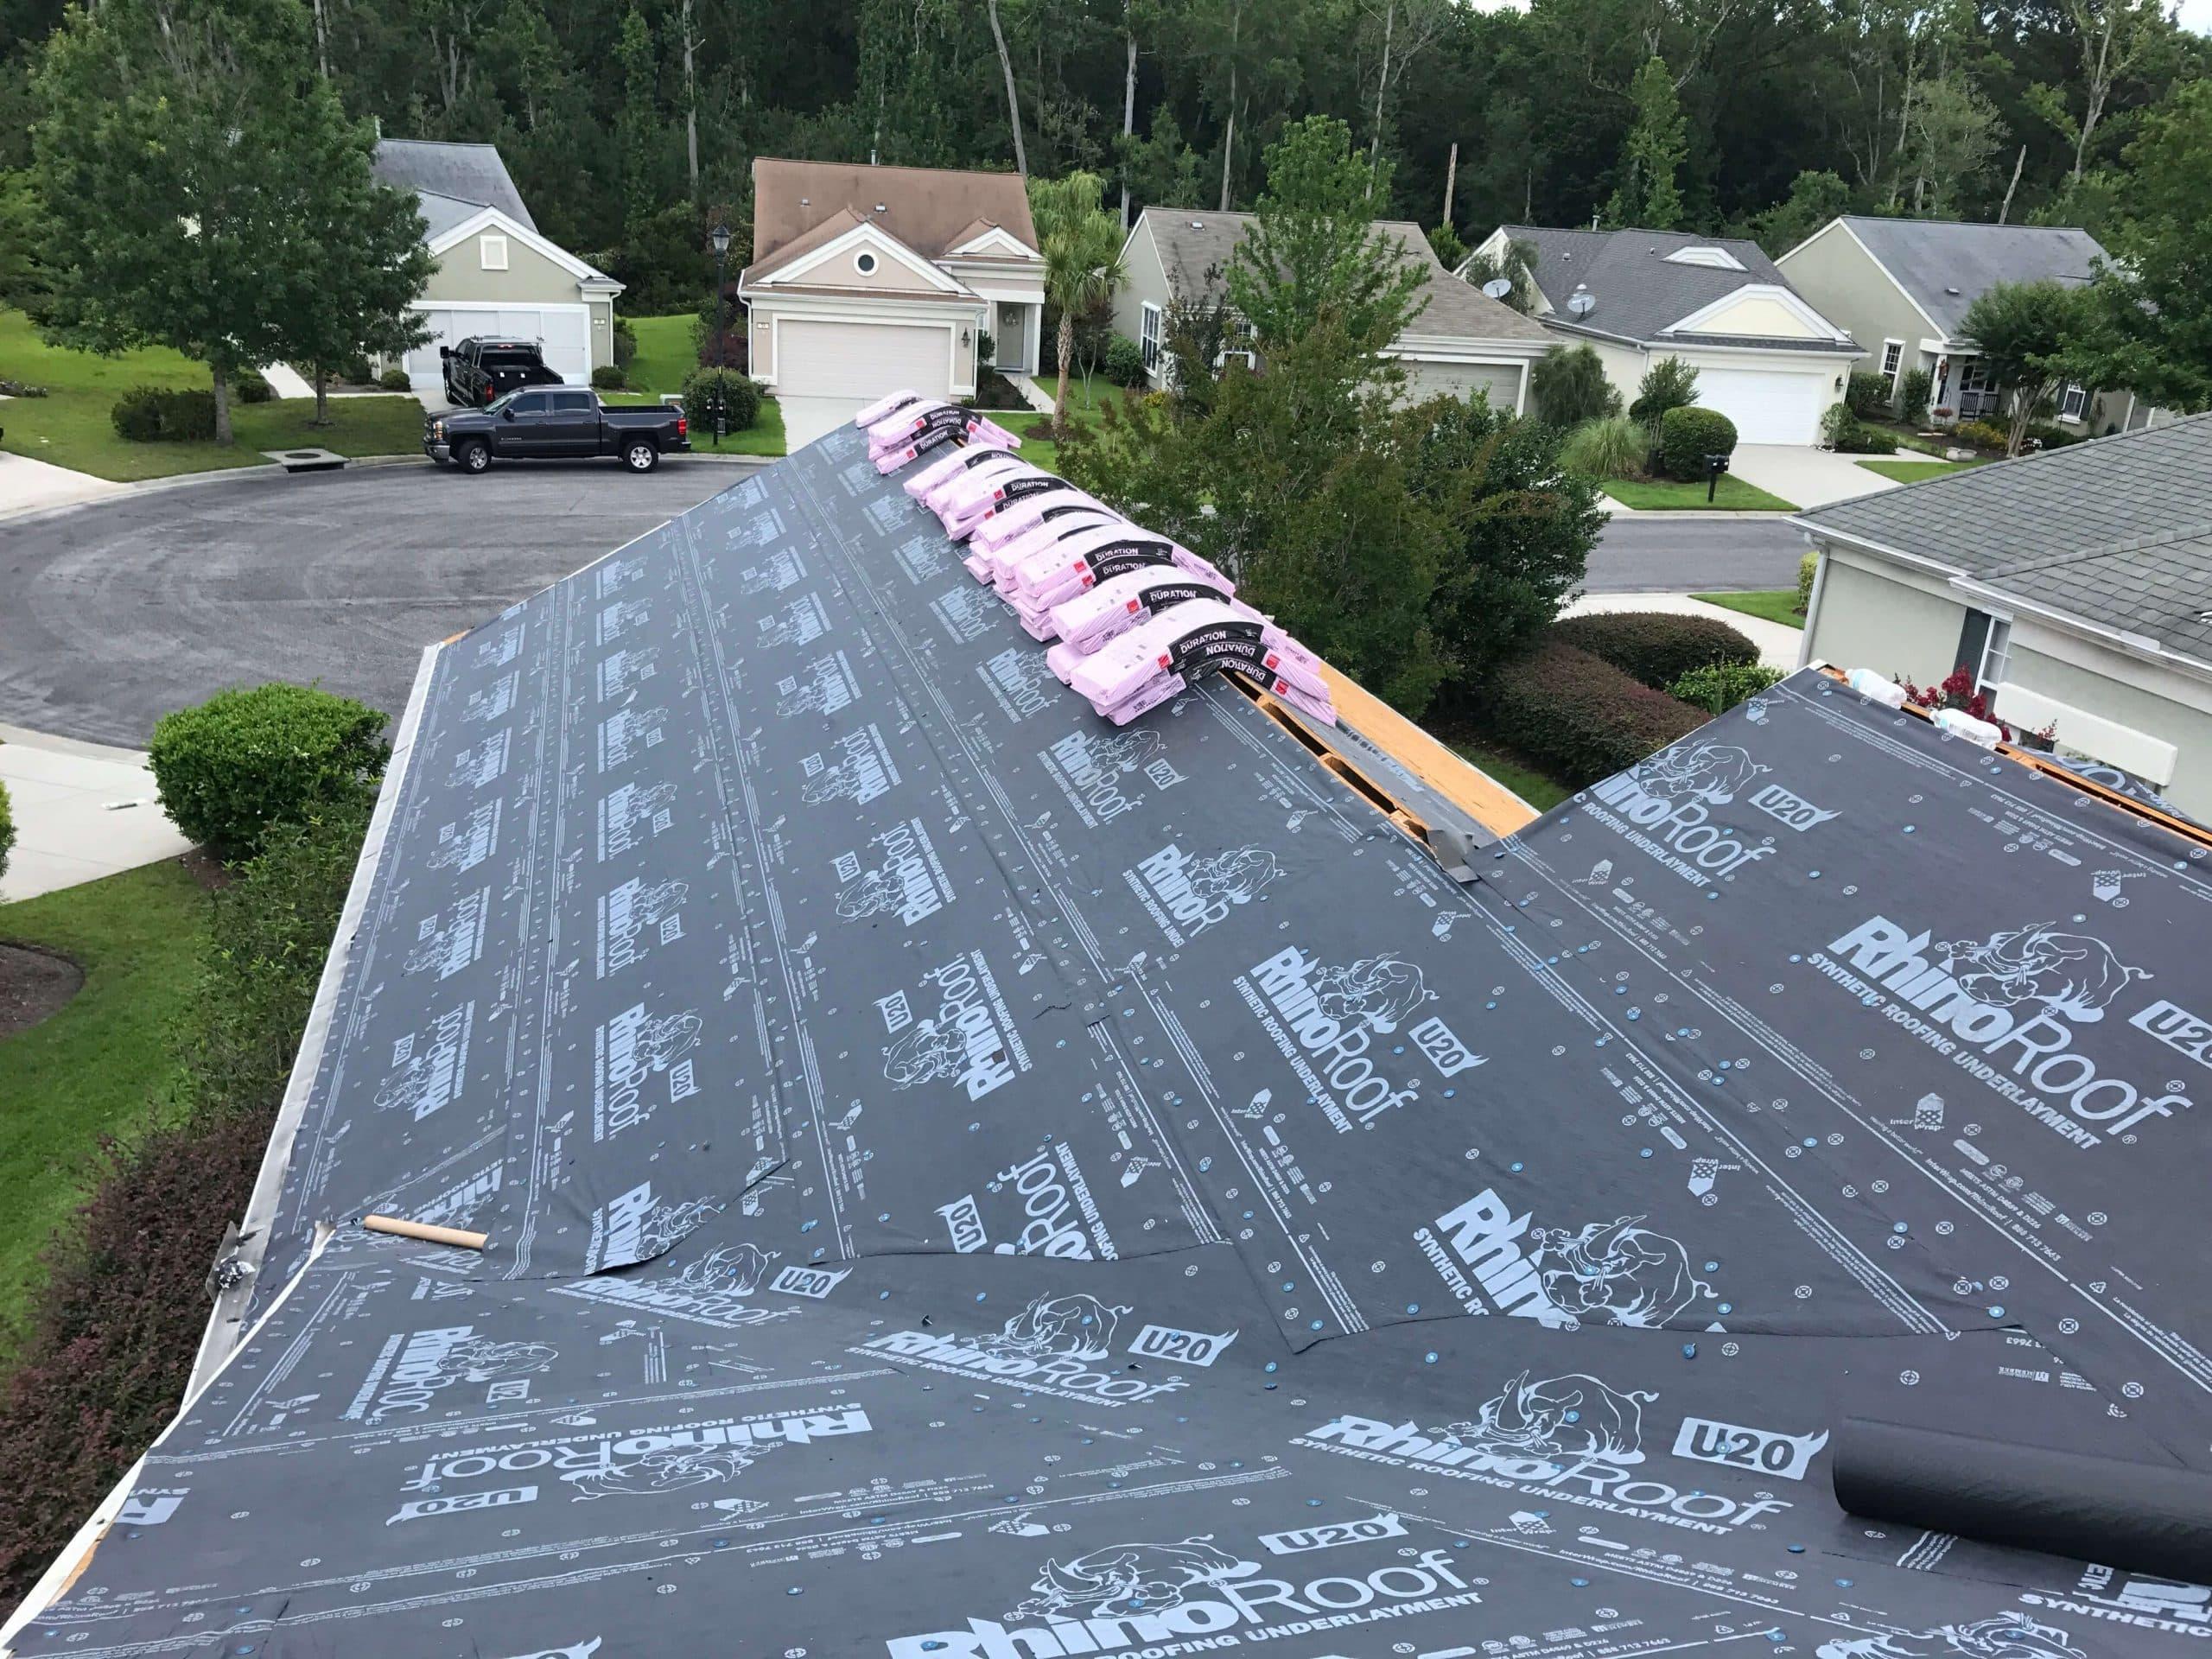 roofing company Hilton head